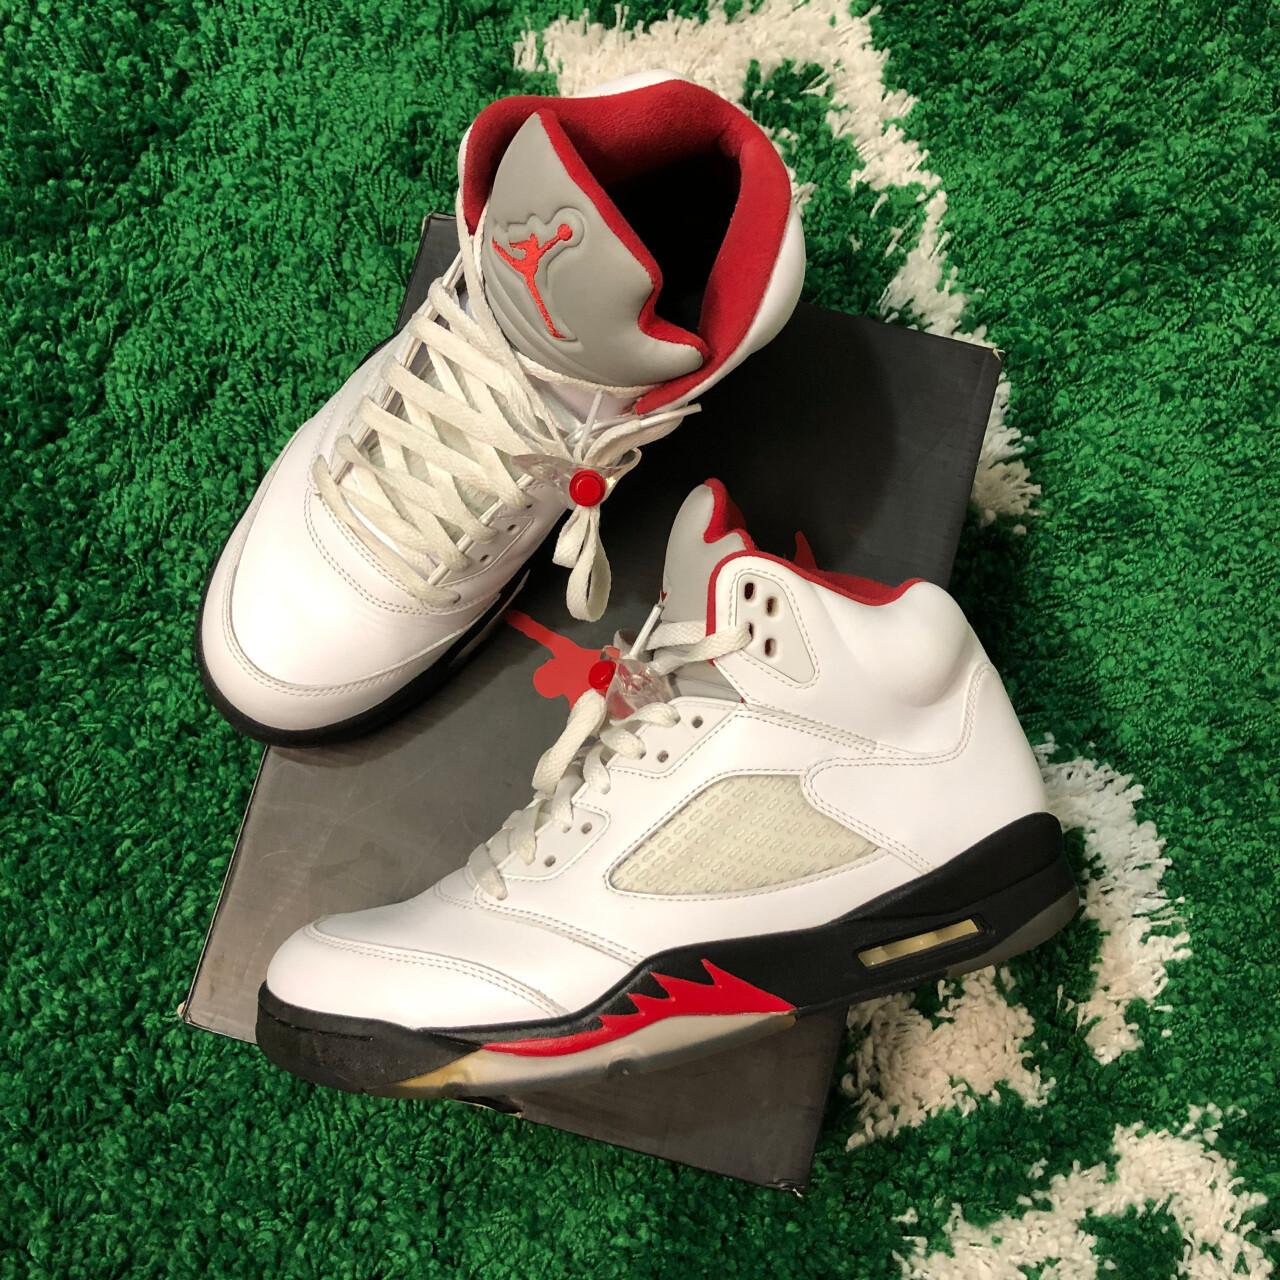 Jordan 5 Retro Fire Red (2013) Size 10